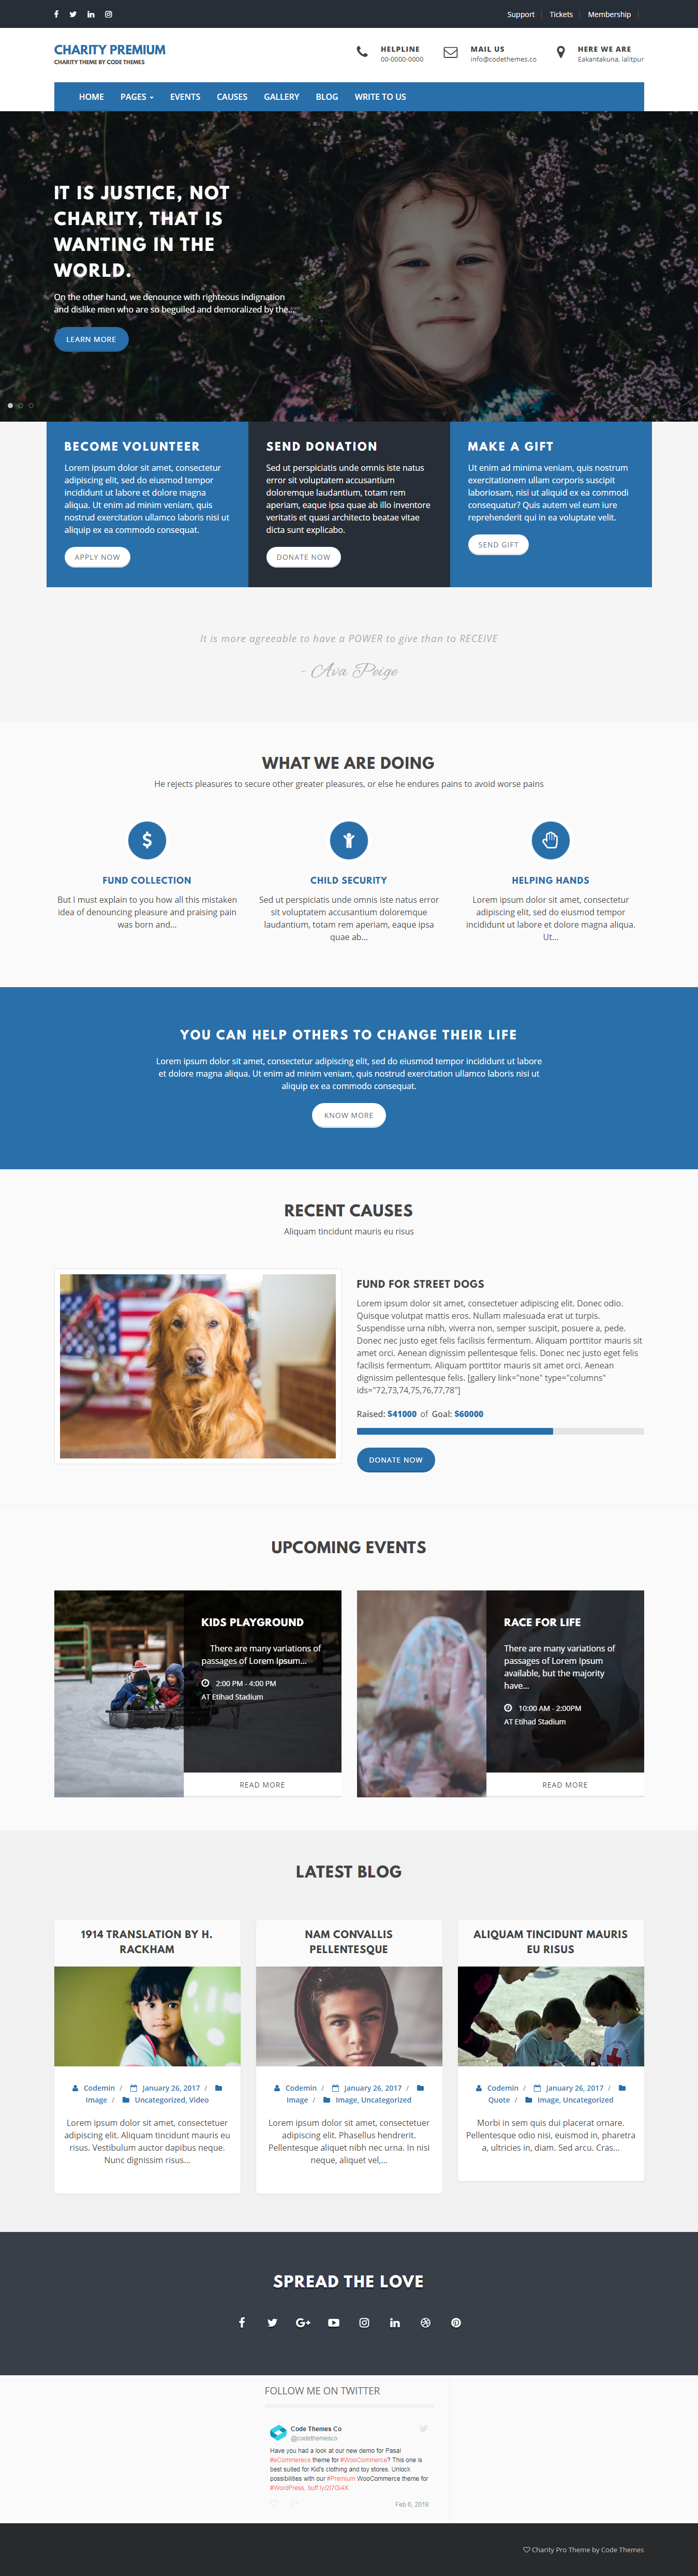 charity review best free church wordpress theme - 10+ Best Free WordPress Church Themes